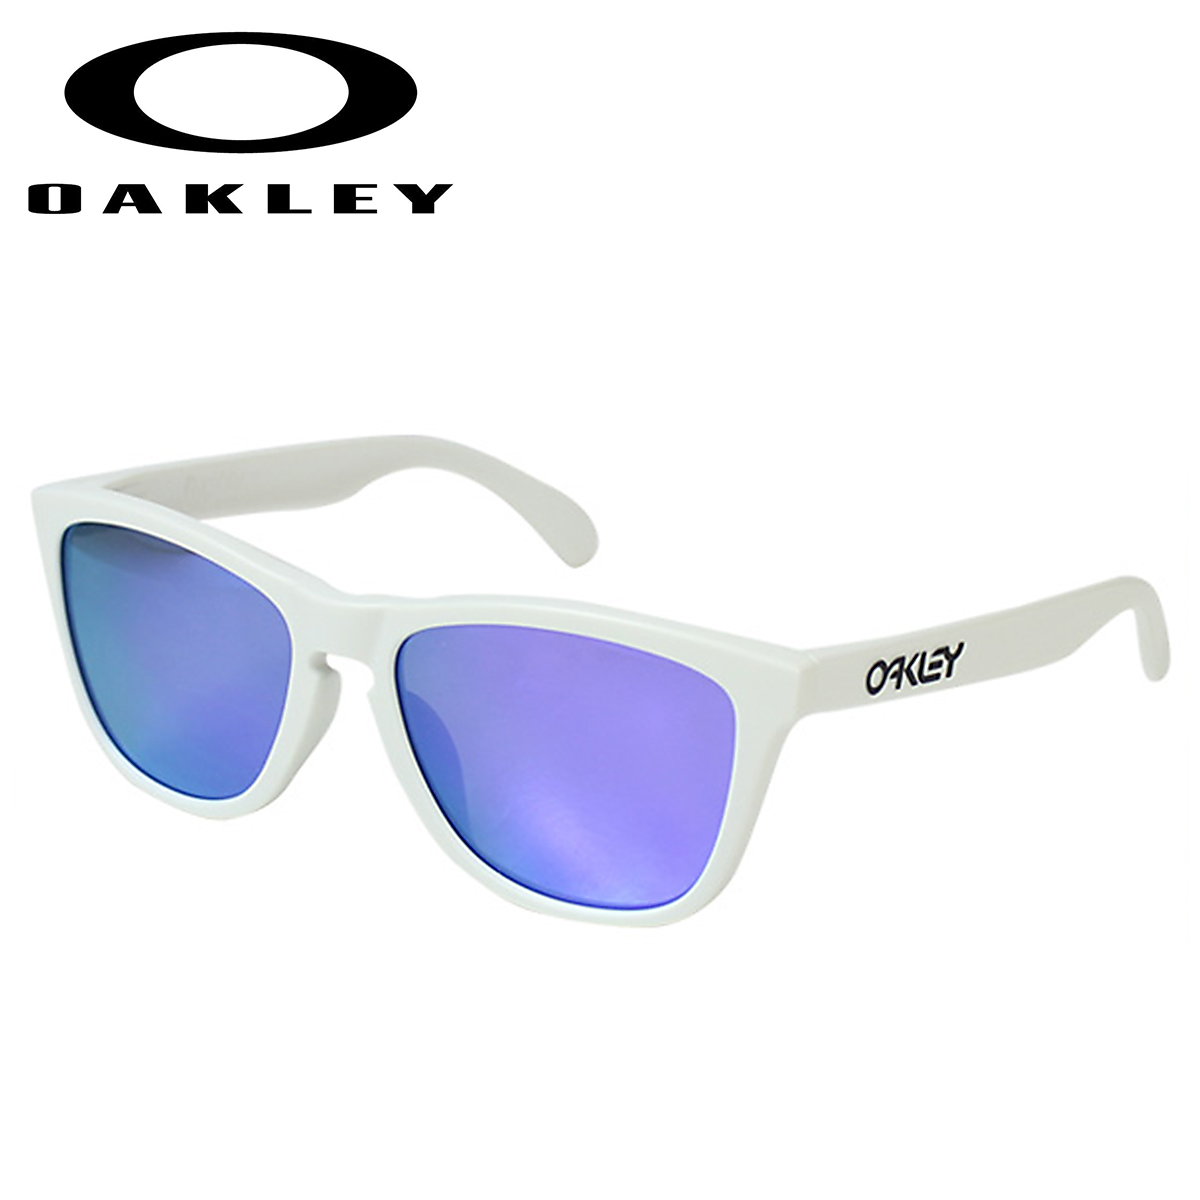 Men Ann Dis Fitting Mackerel Oo9245 Fit Horse Mat Frogskins 17 White Oakley Asian Frog Skin Sunglasses Gap oerCxBQdW